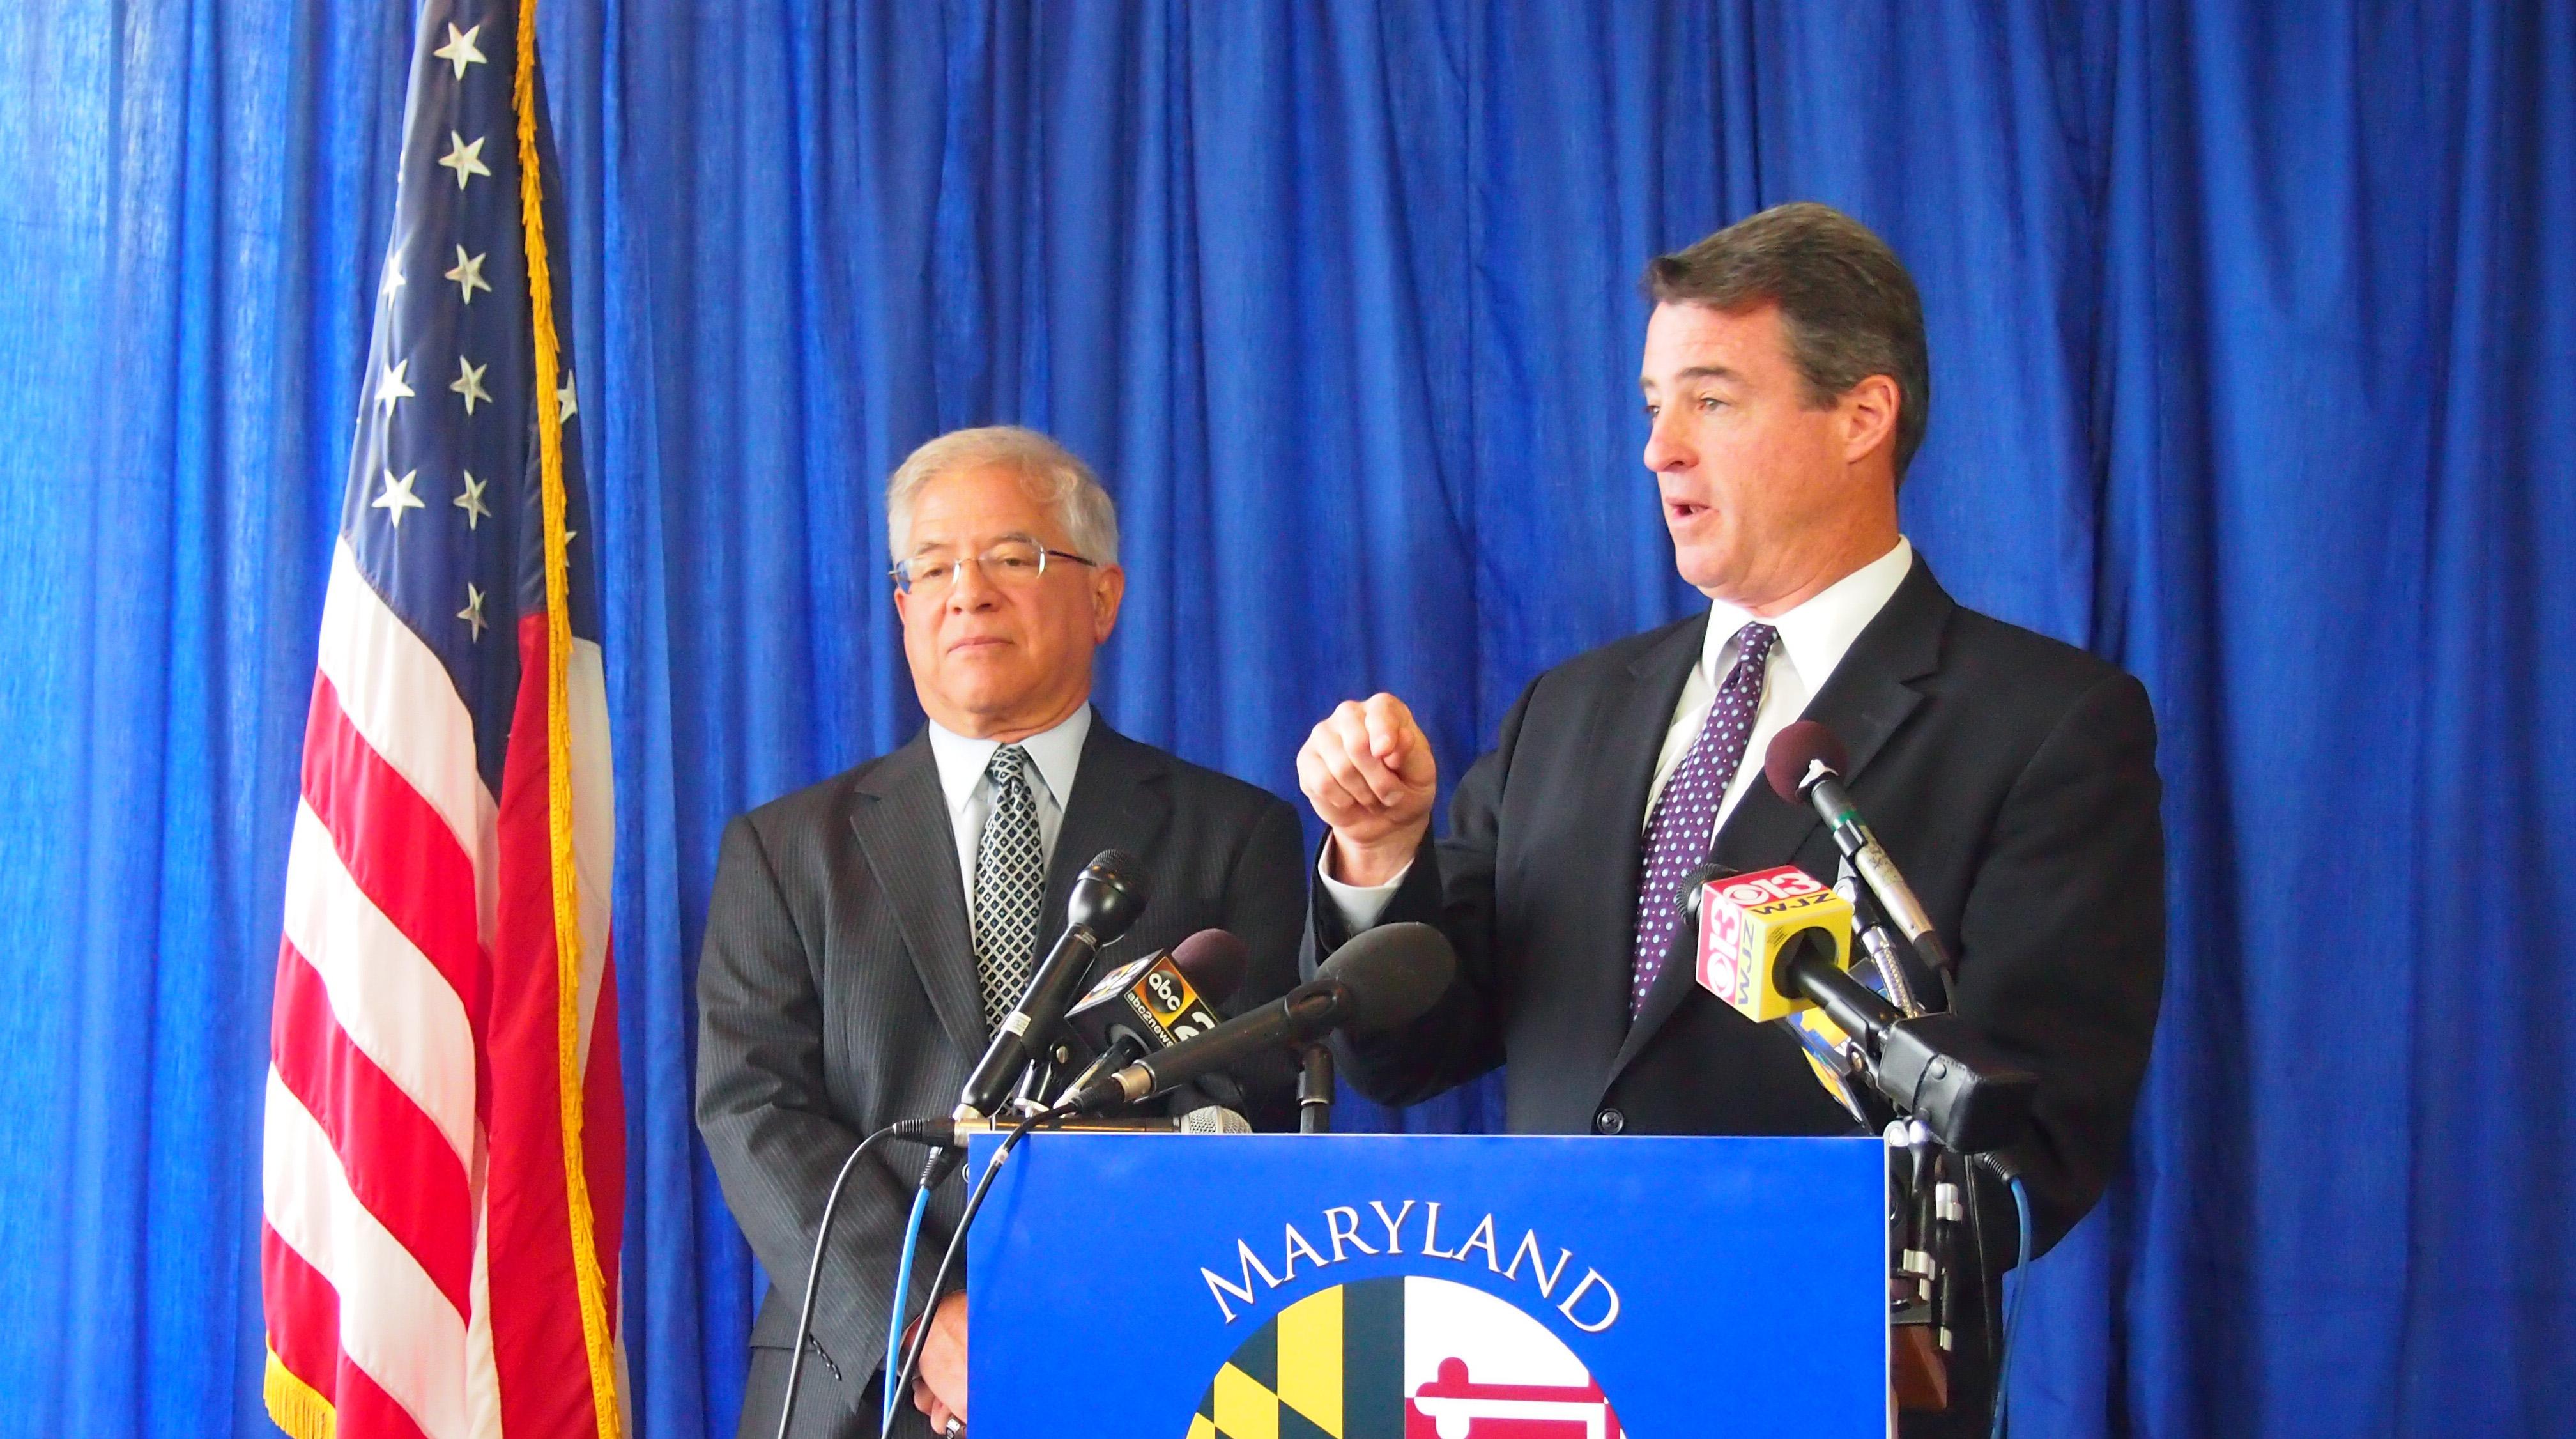 Delegate Sandy Rosenberg and Attorney General Doug Gansler